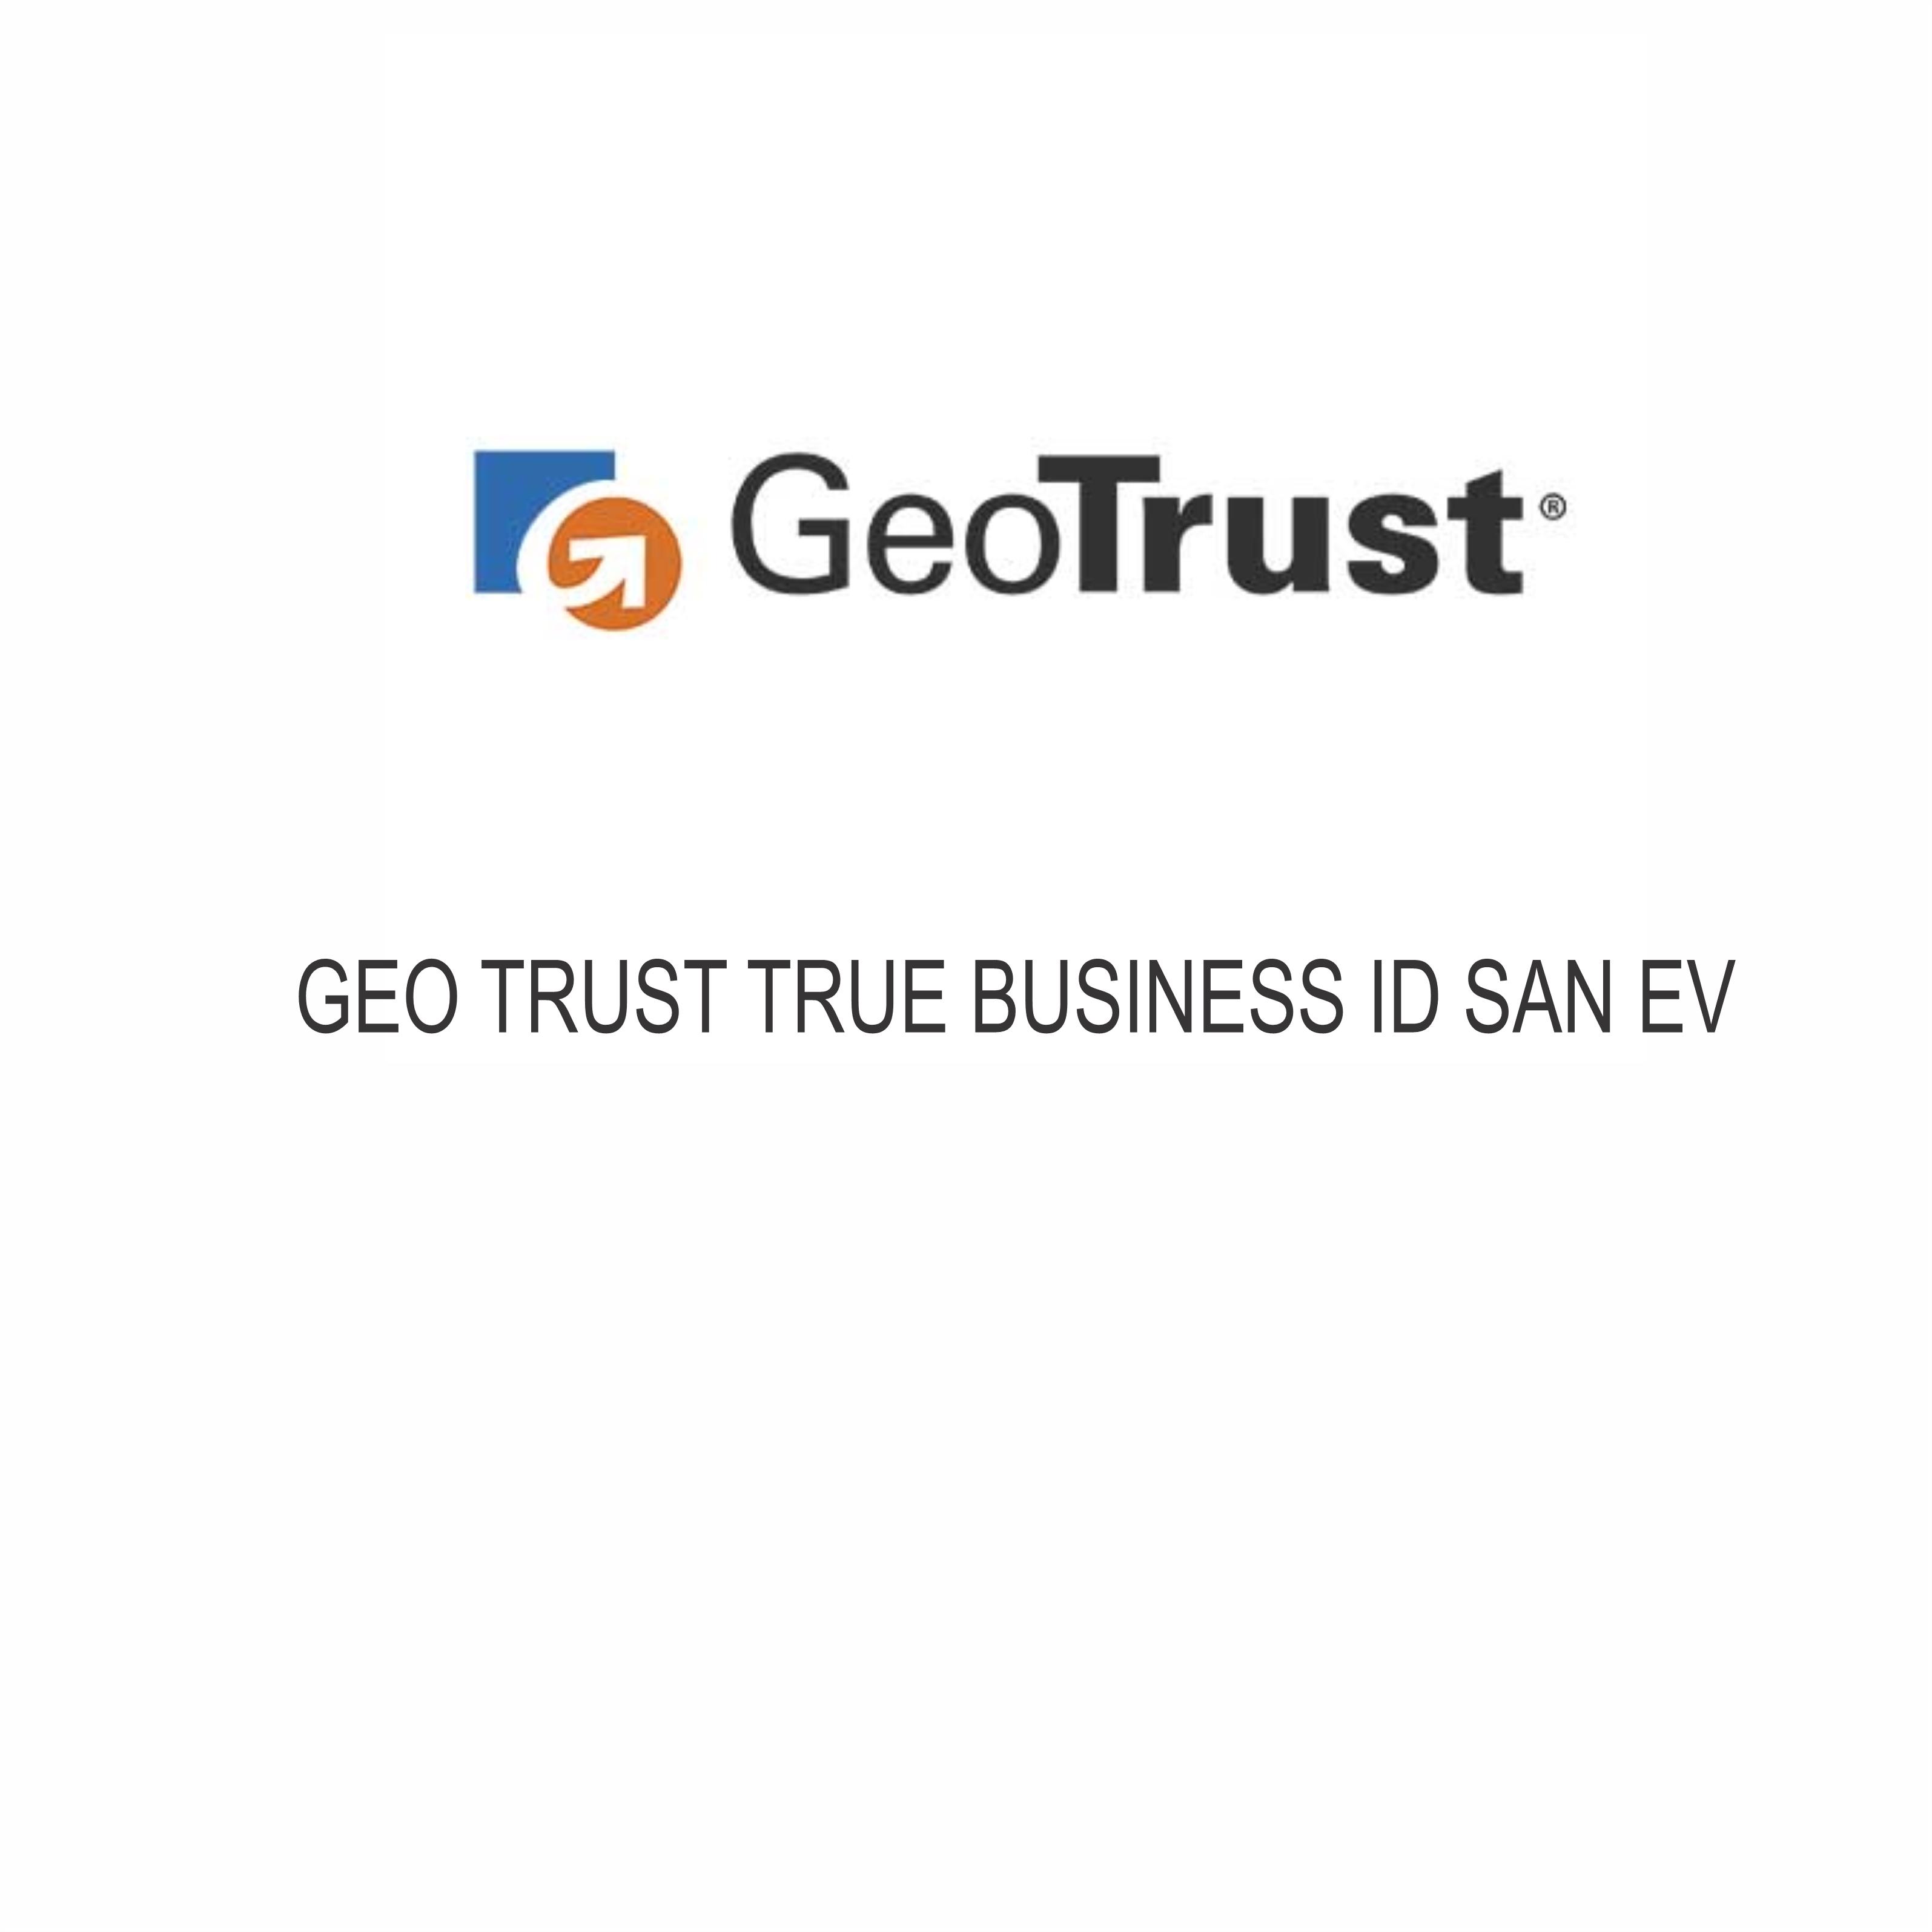 GeoTrust True BusinessID SAN EV